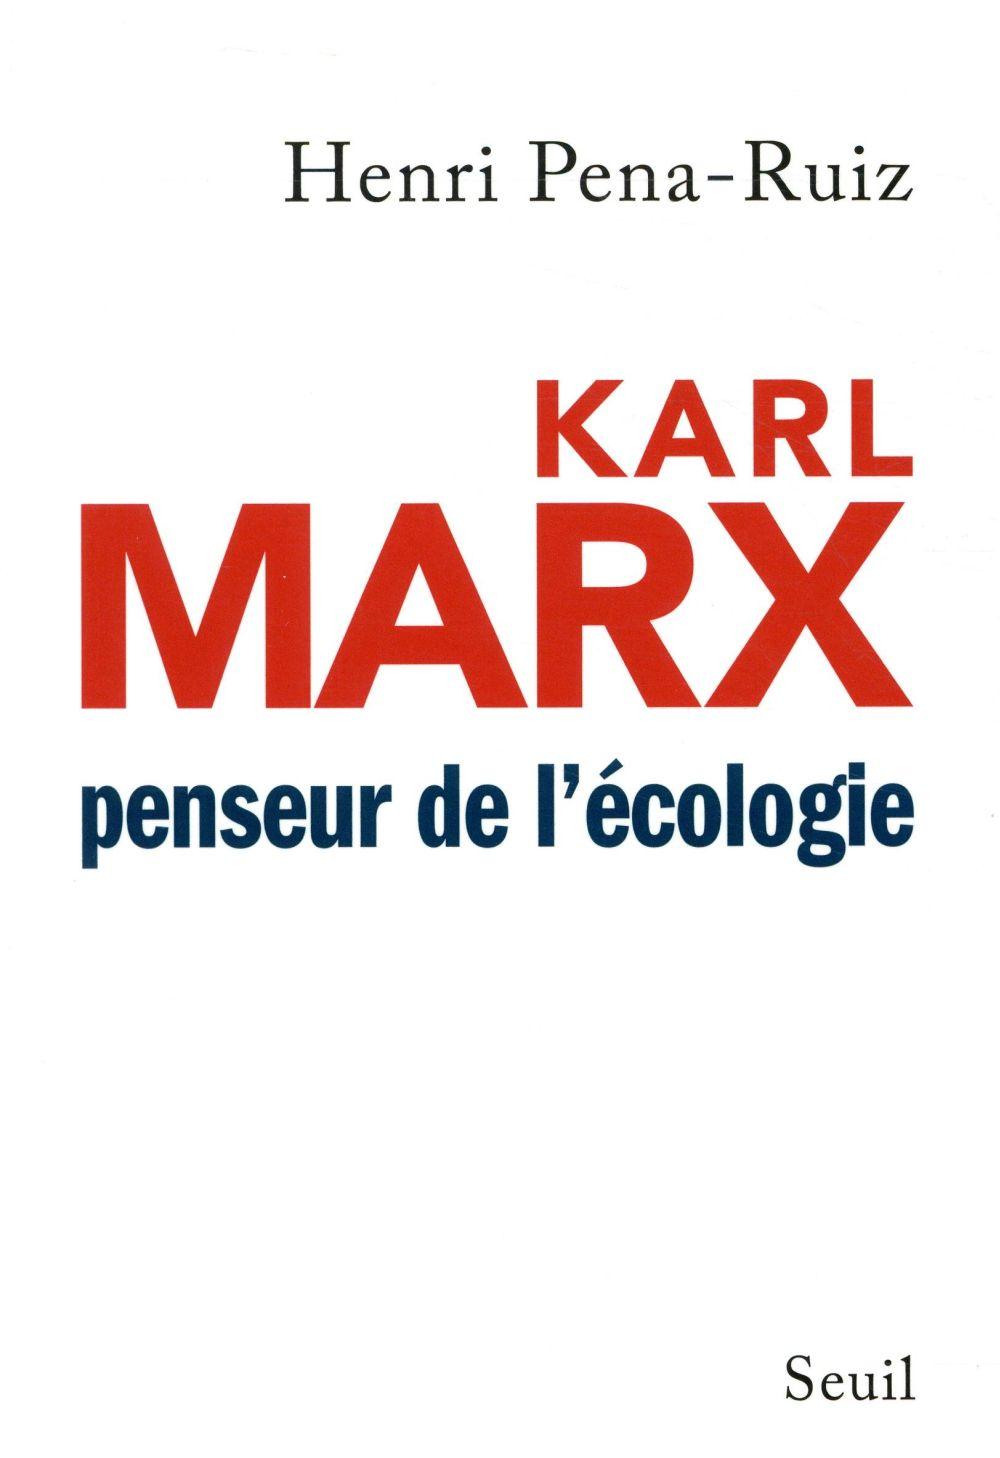 KARL MARX PENSEUR DE L'ECOLOGIE